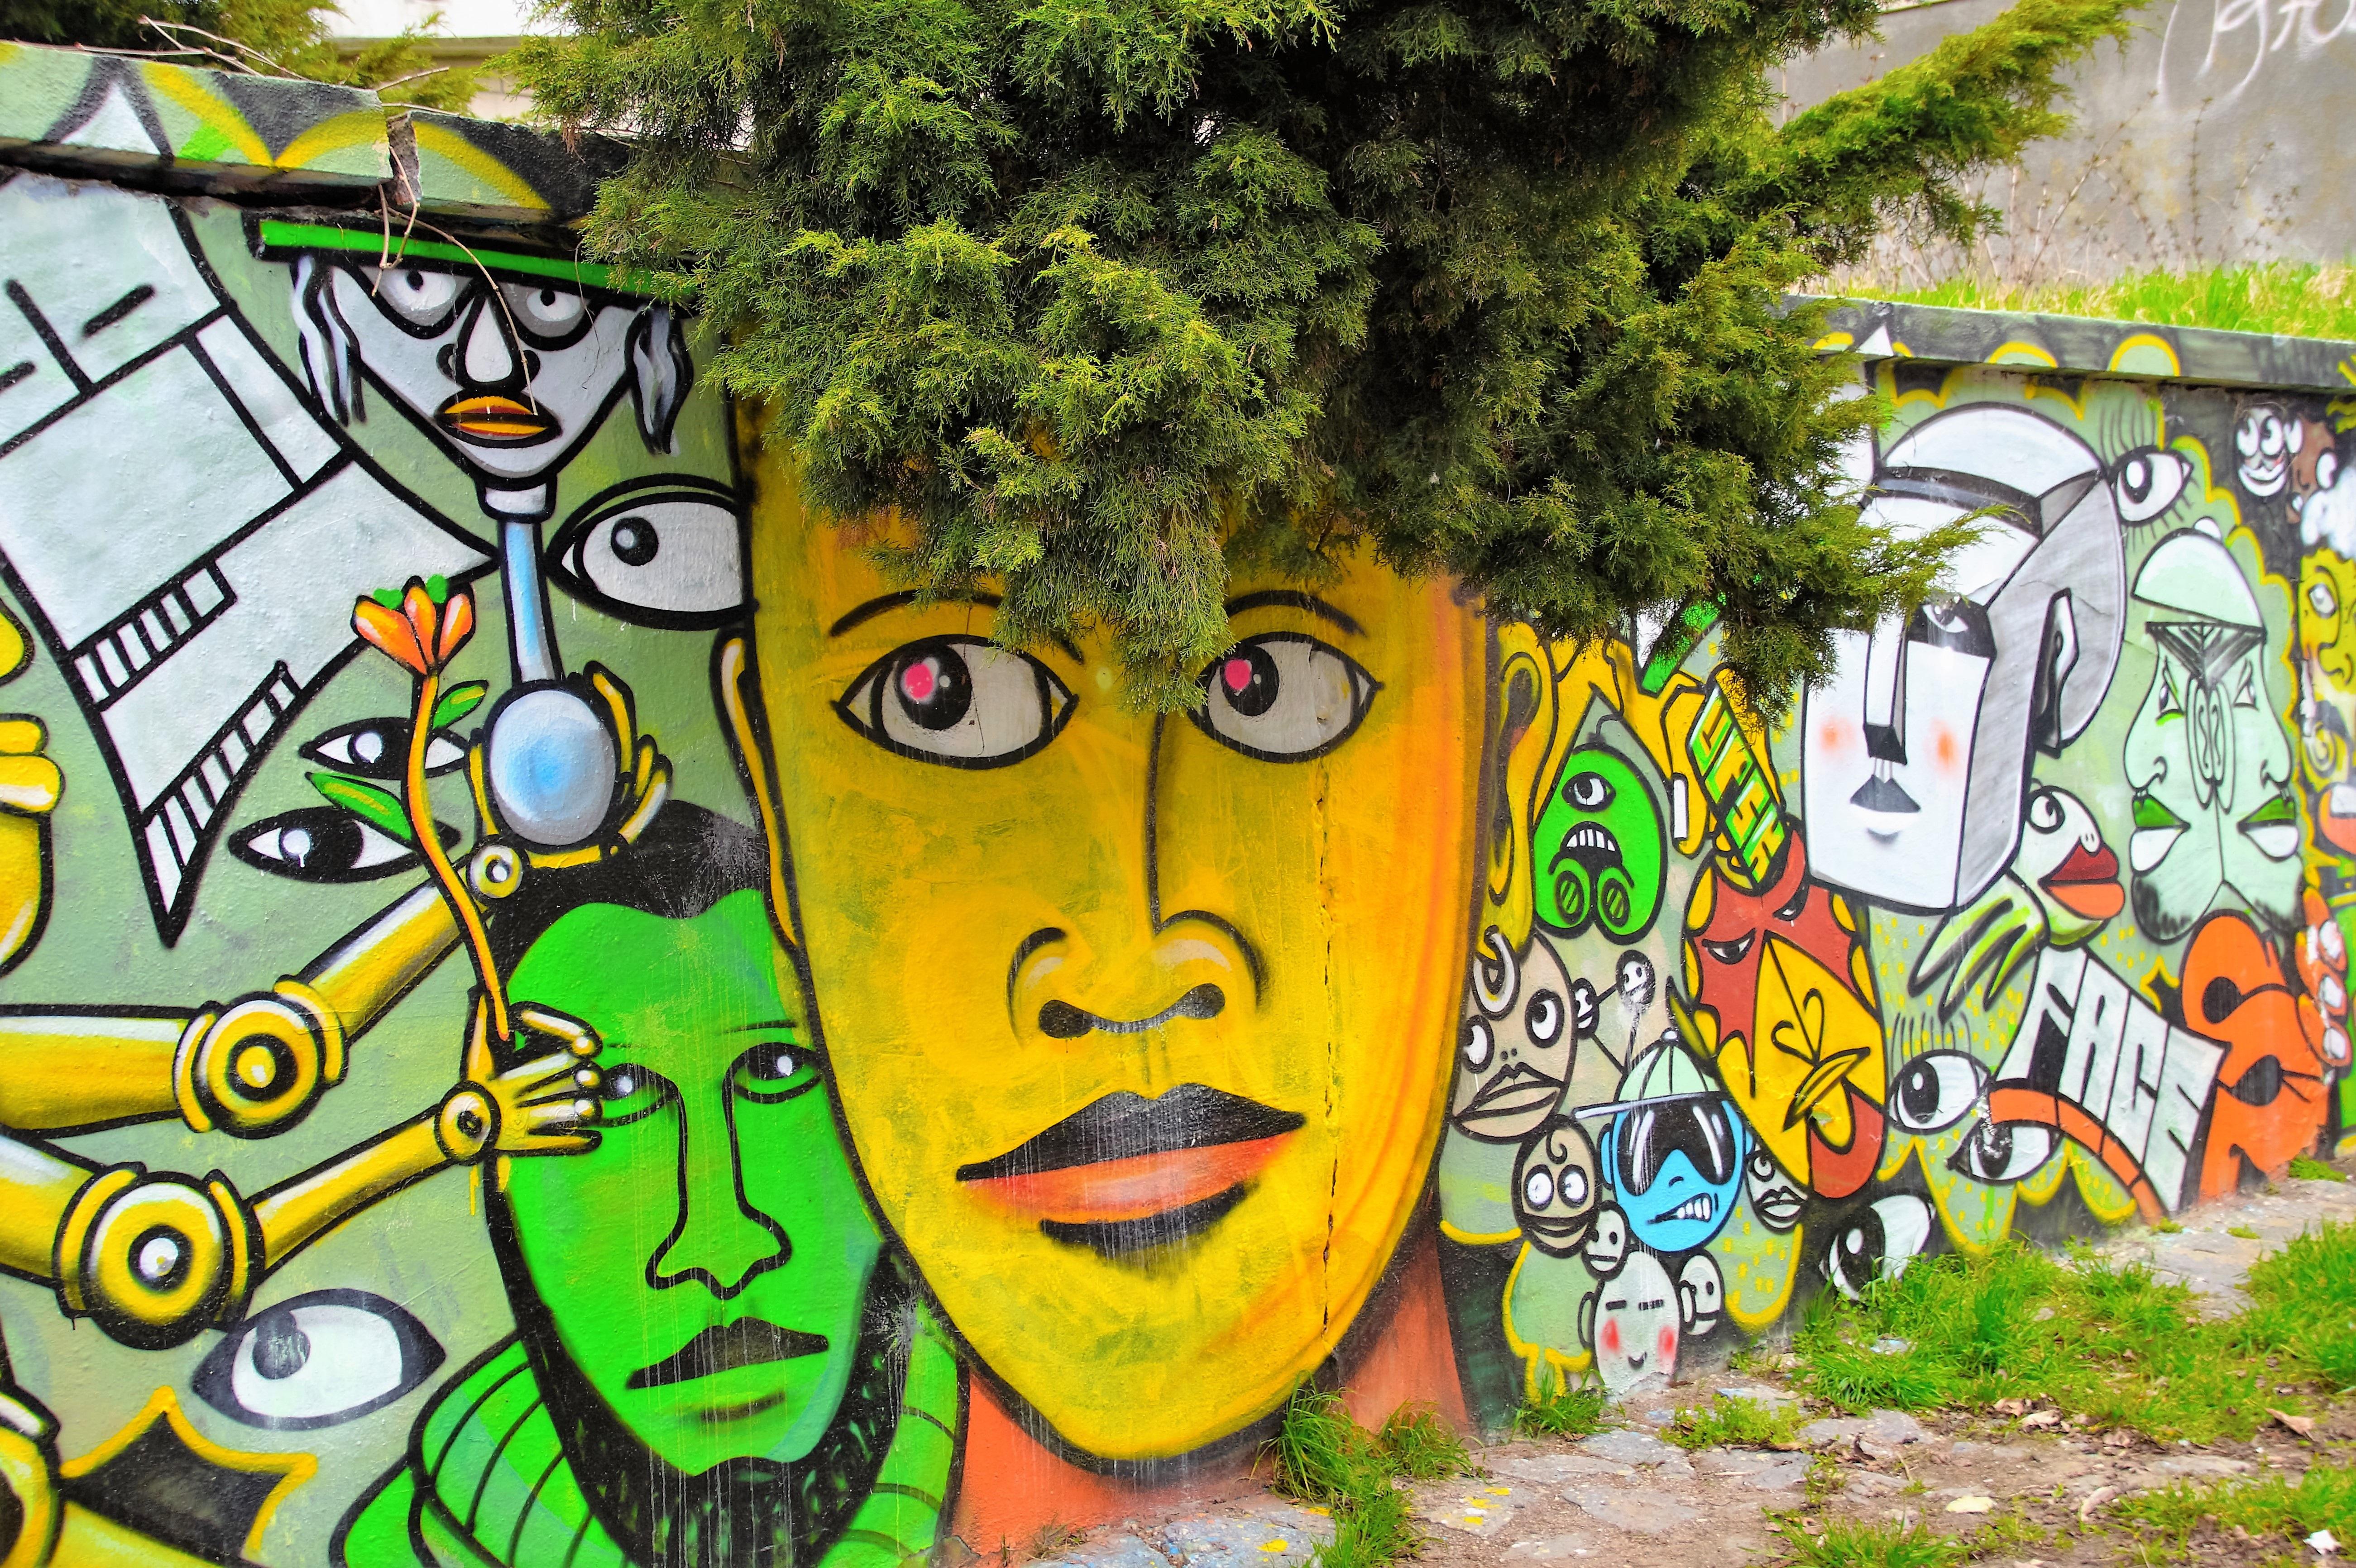 Free Images : graffiti, street art, mural, image, graphite, modern ...